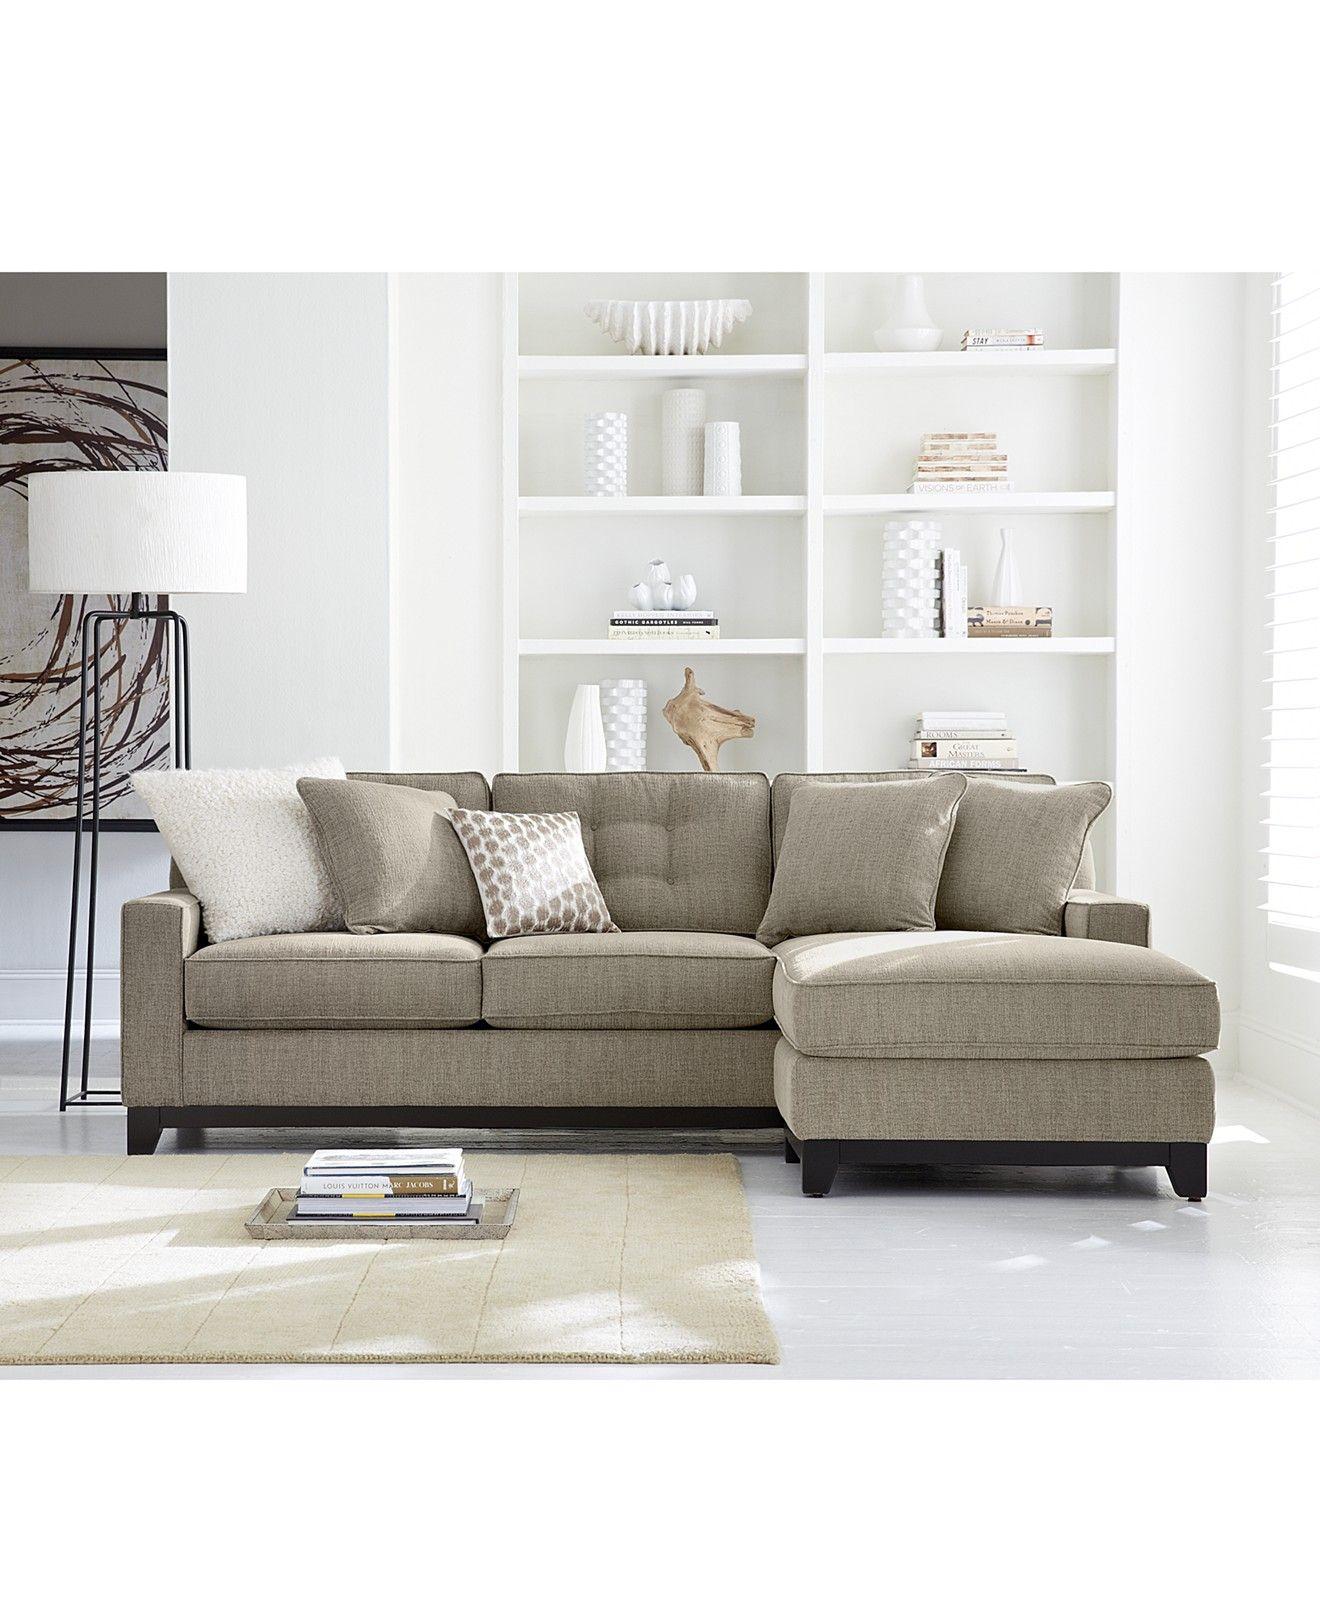 Clarke Fabric 2 Piece Sectional Sofa Custom Colors Sofas Furniture Macy S